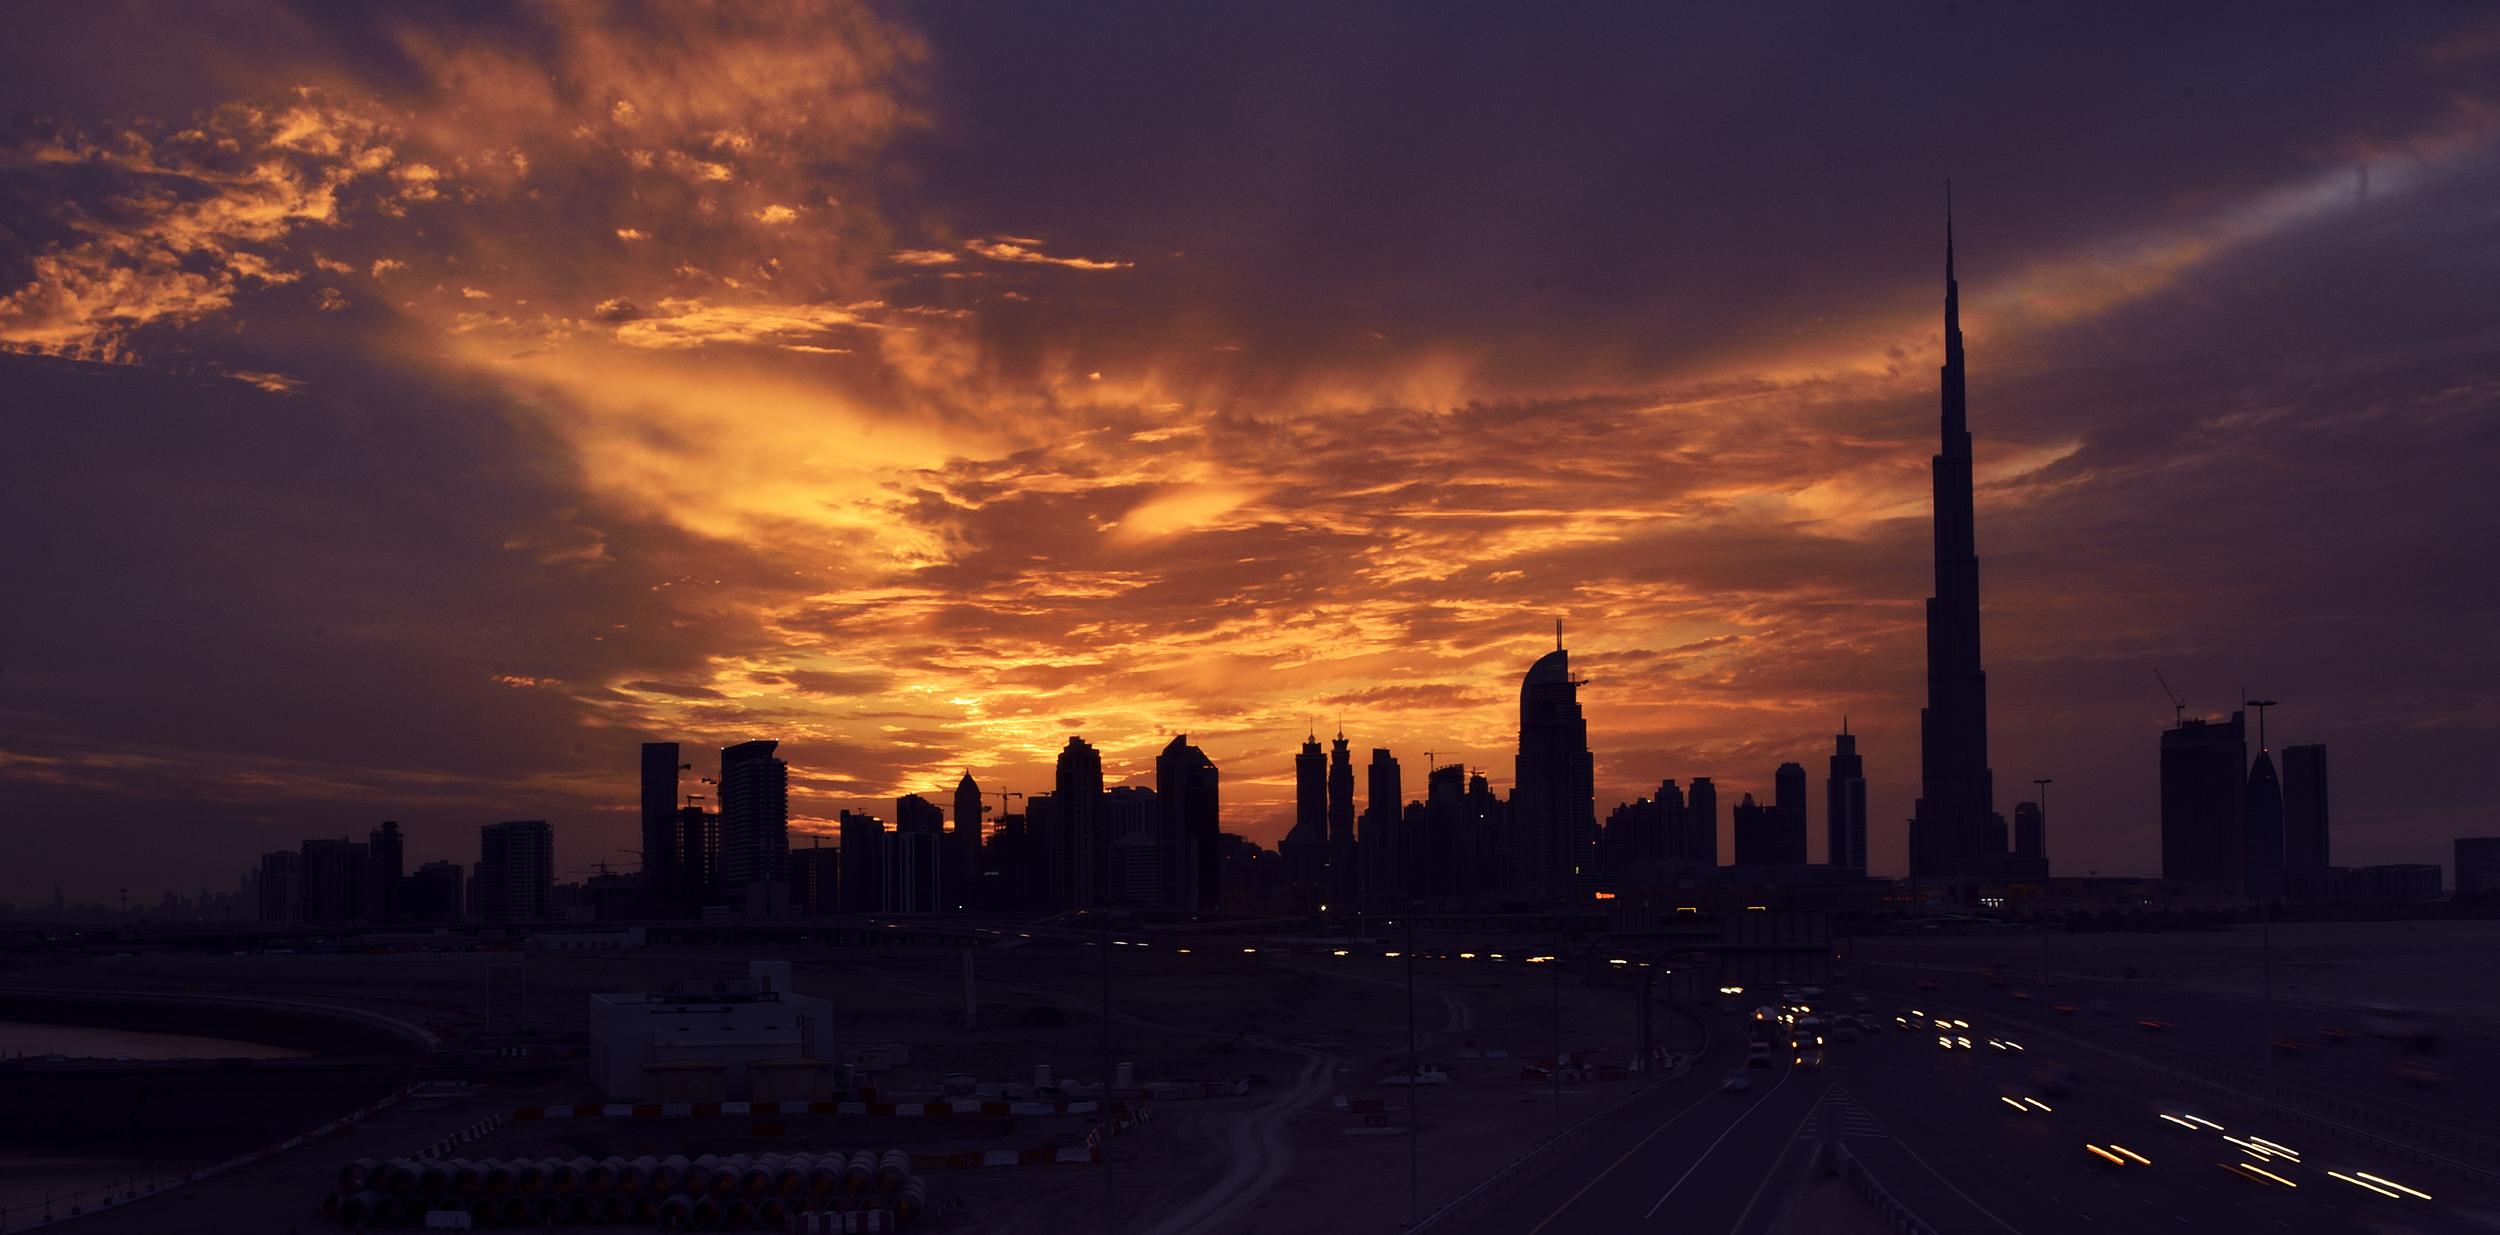 Dubai Skyline during Sunset.